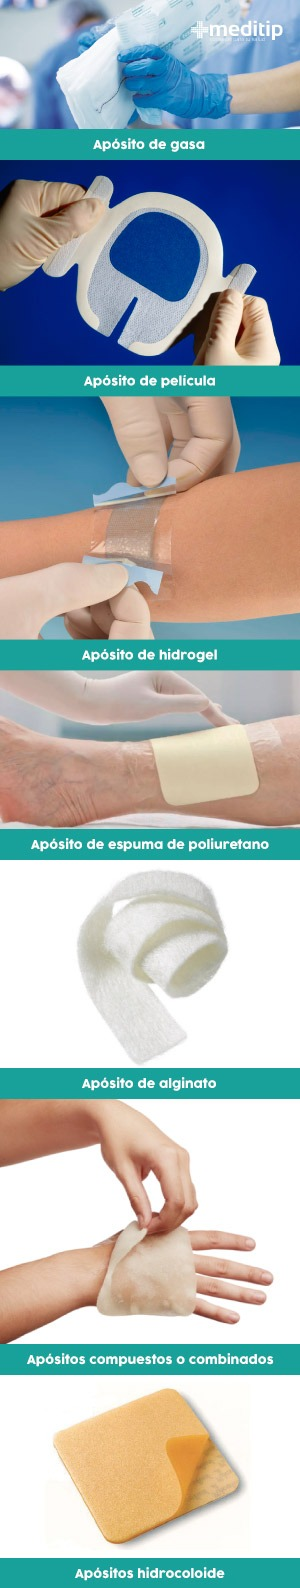 Tipos de apósitos para heridas